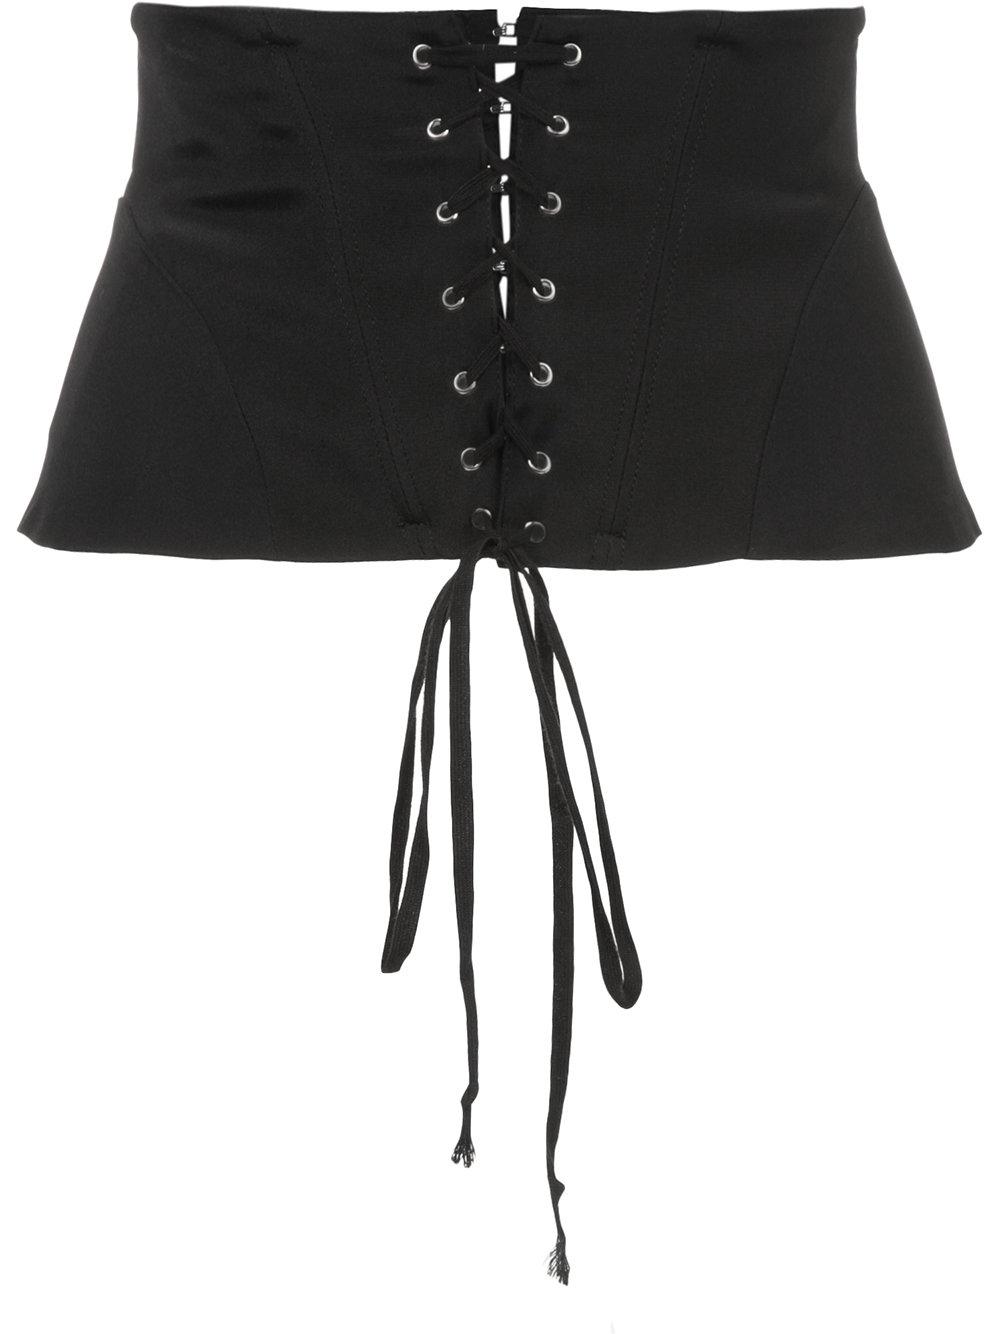 FLEUR DU MAL lacing corset belt, 12348₽ (-10% на первый заказ | m10xff)